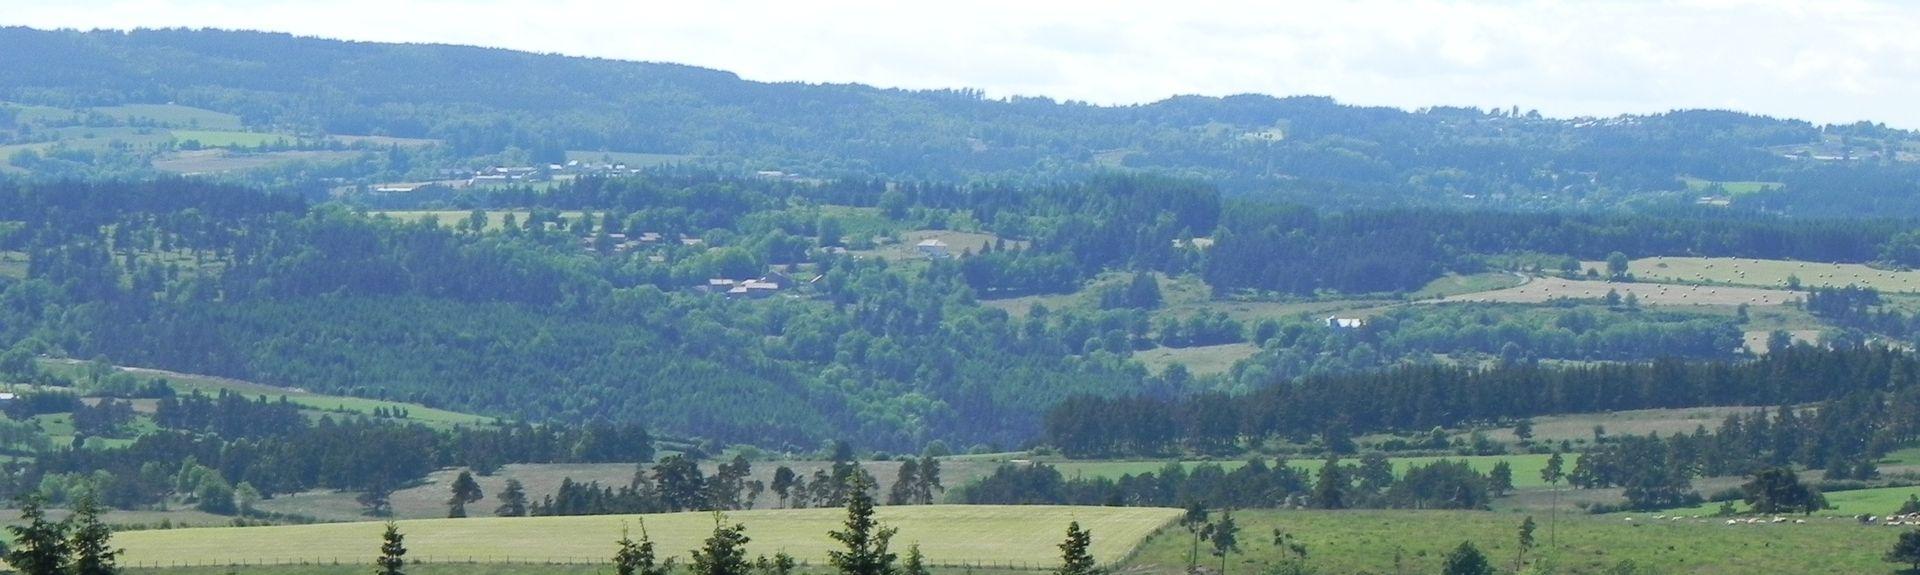 Blavignac, Occitanie, Frankrijk